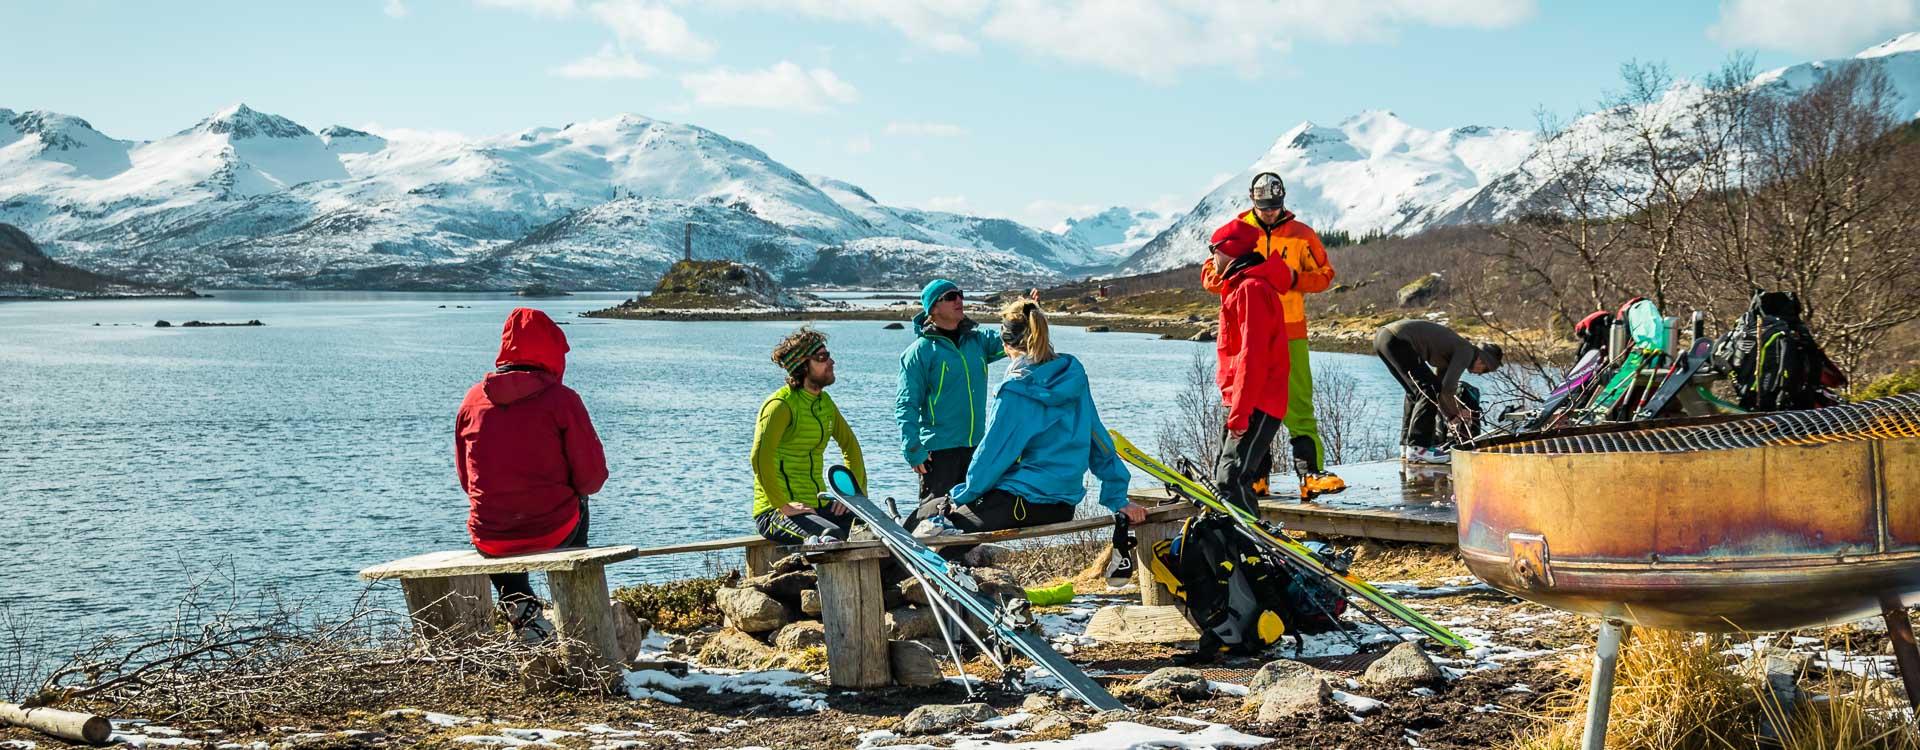 Pause am Meer bei der Skitouren Woche Lofoten in Norwegen